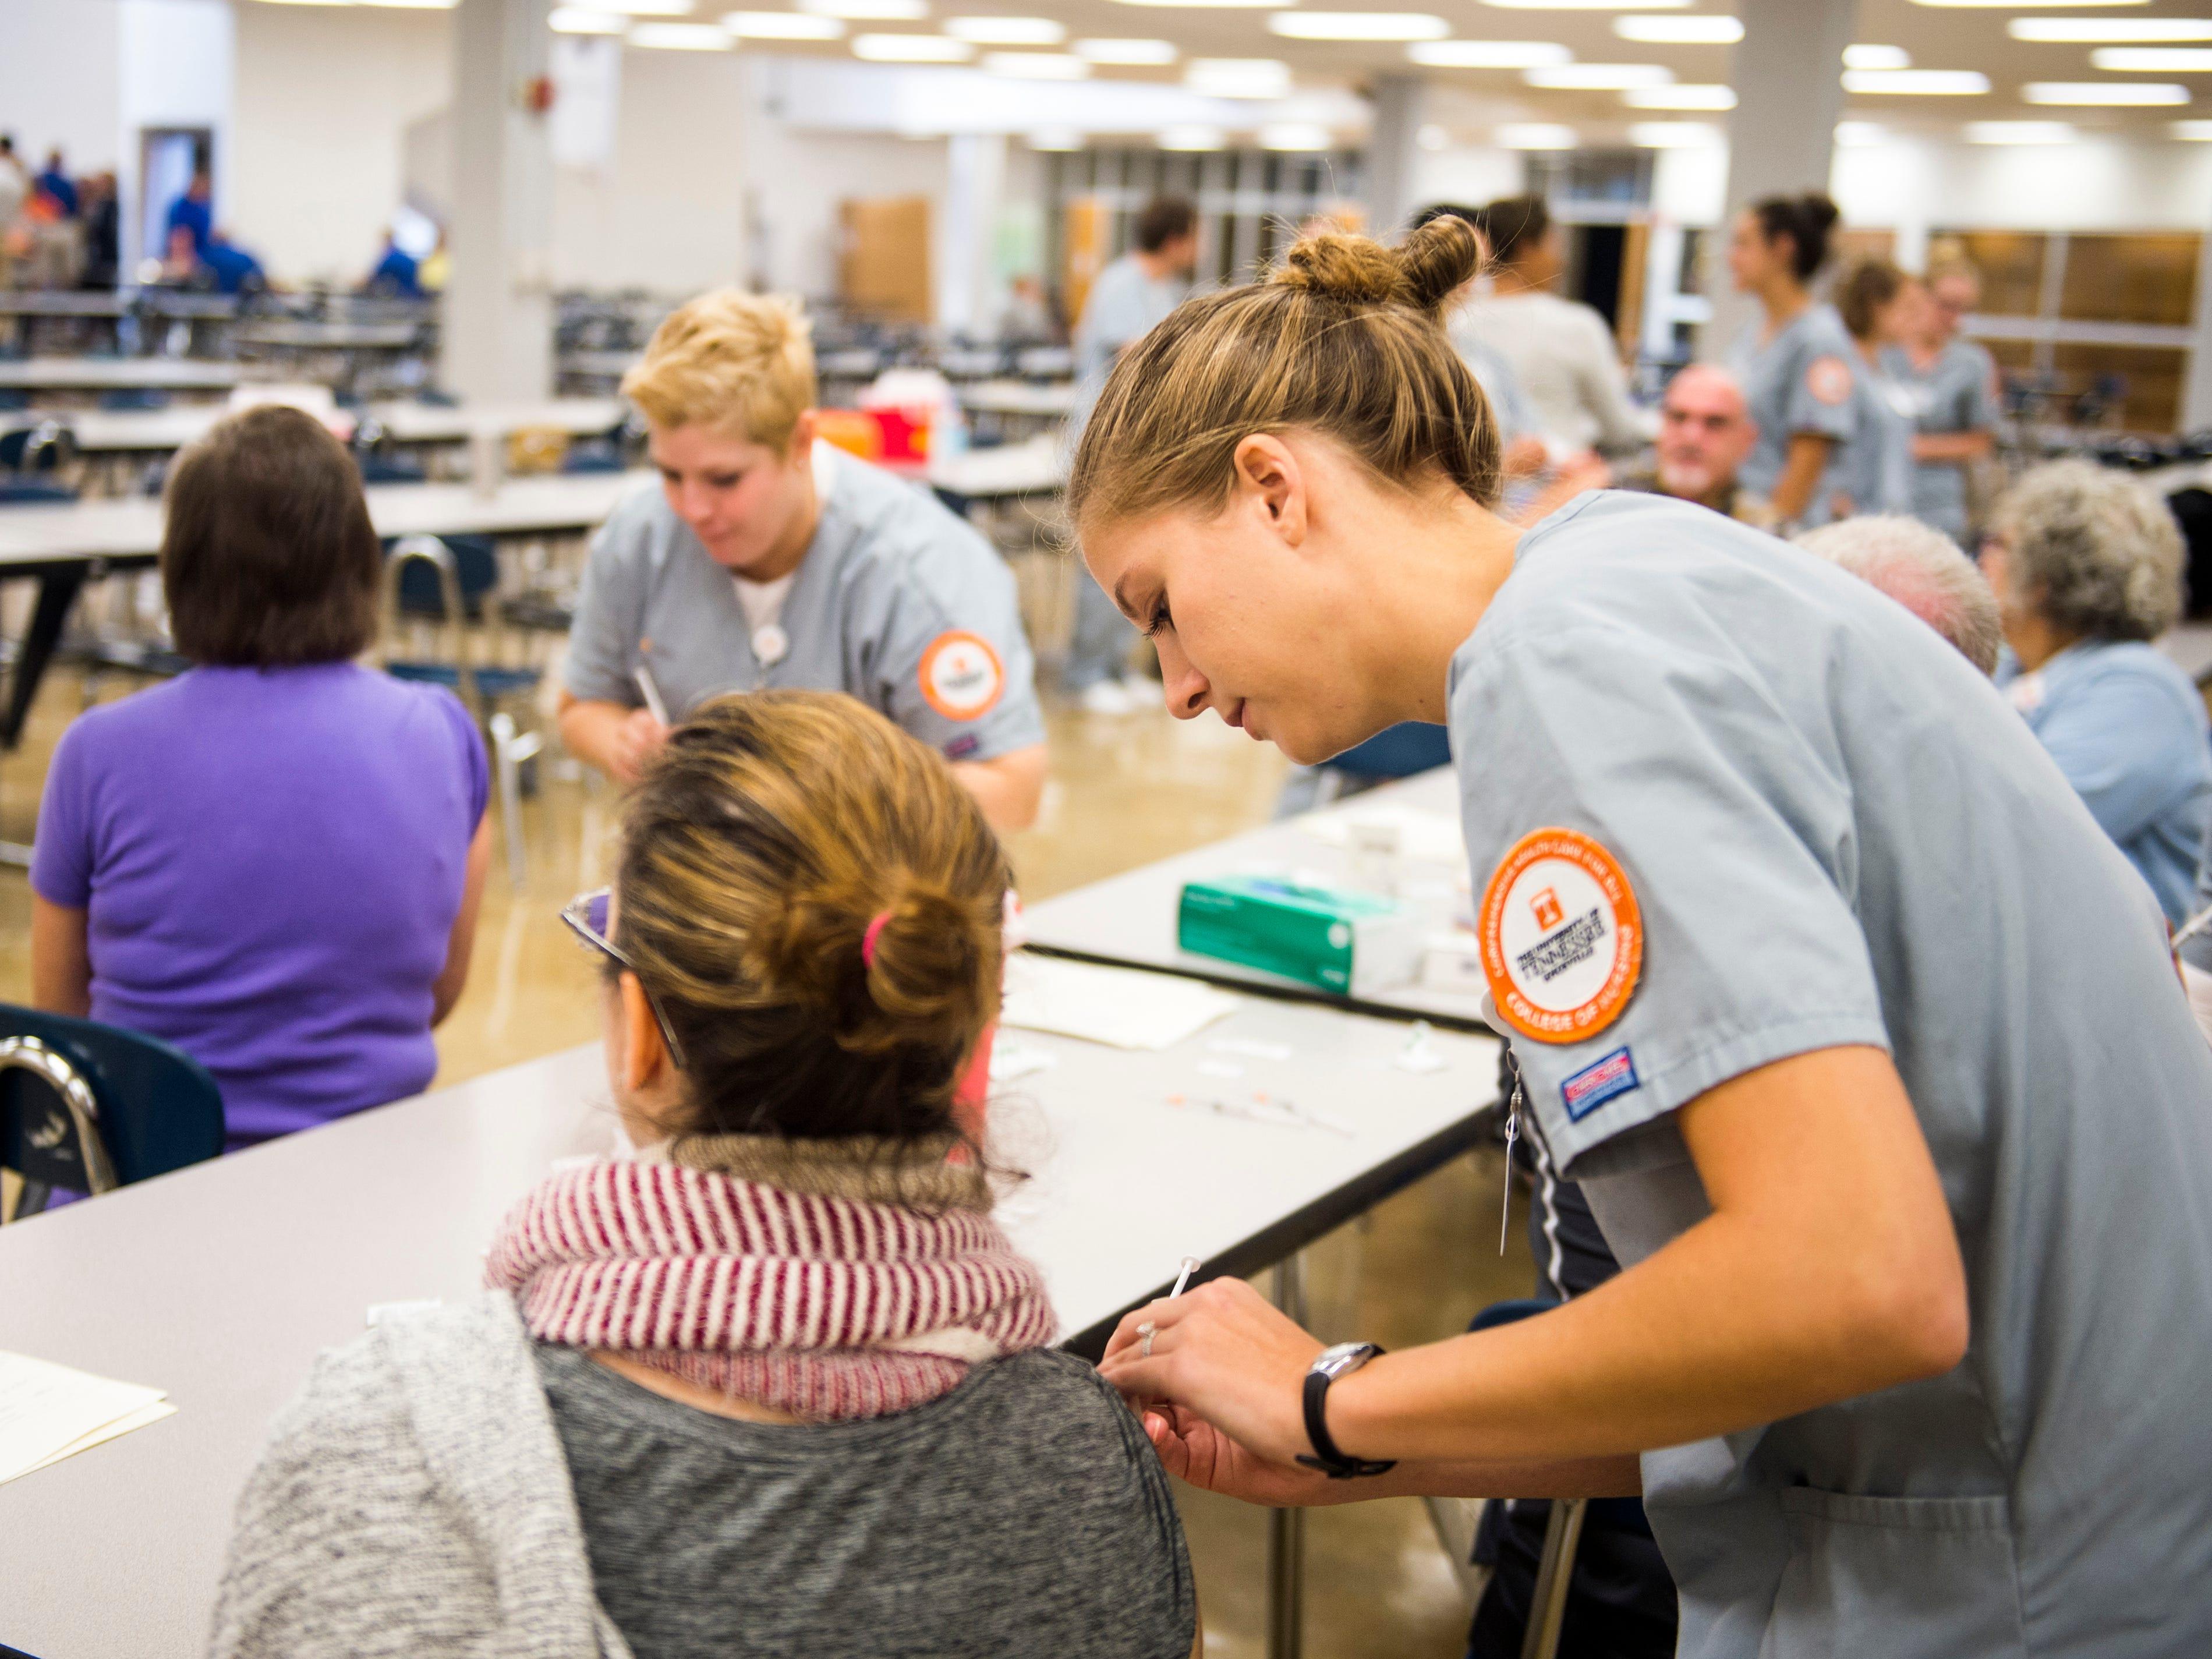 UT nursing student Emily Easterly administers a flu shot at Farragut High School during Free Flu Shot Saturday on Saturday, October 12, 2018.